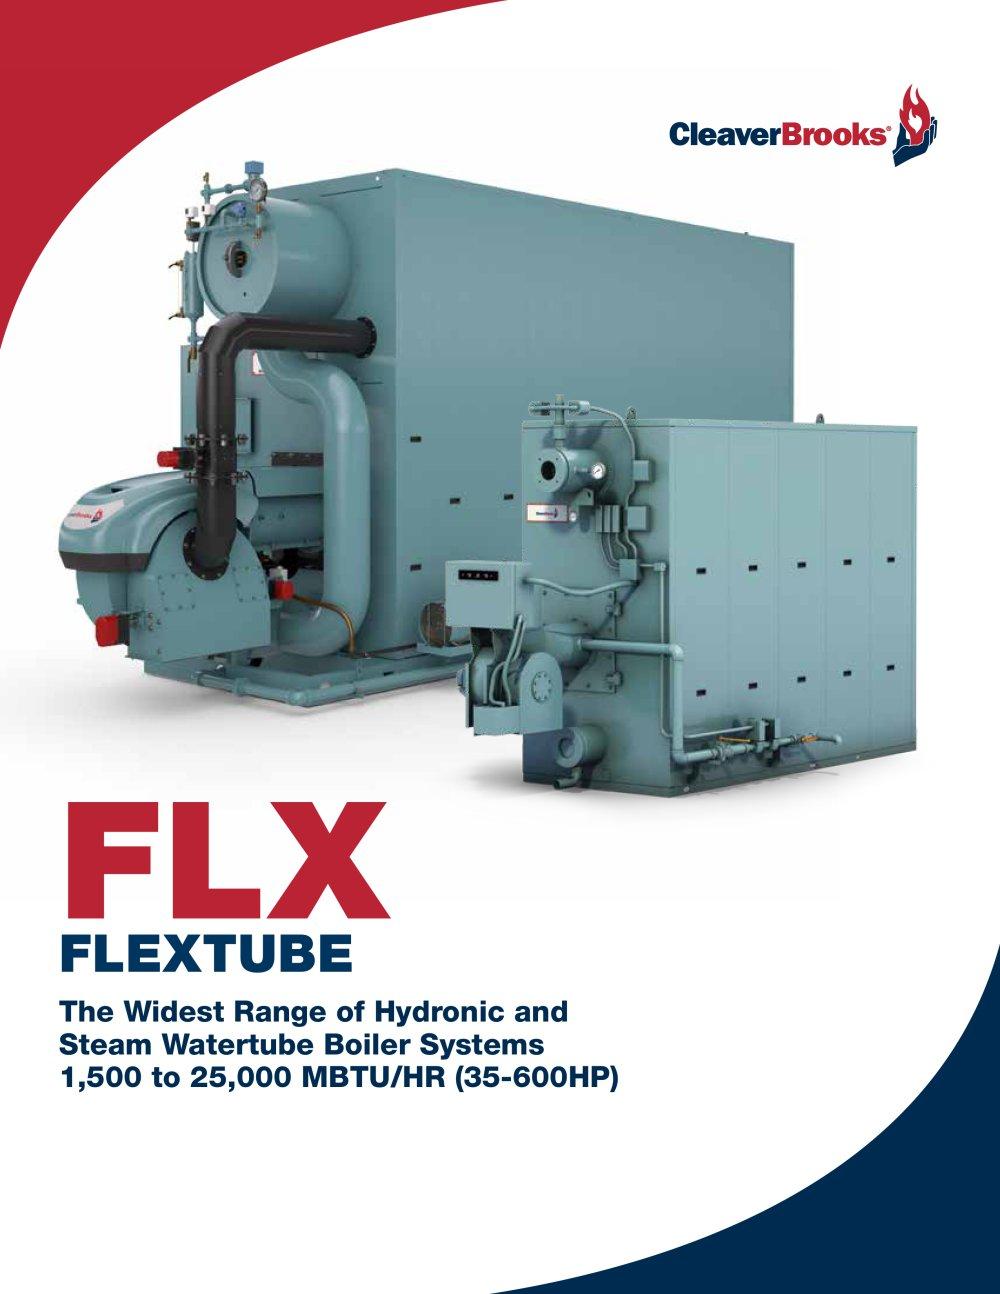 FLX Flextube - Cleaver-Brooks - PDF Catalogue | Technical ...